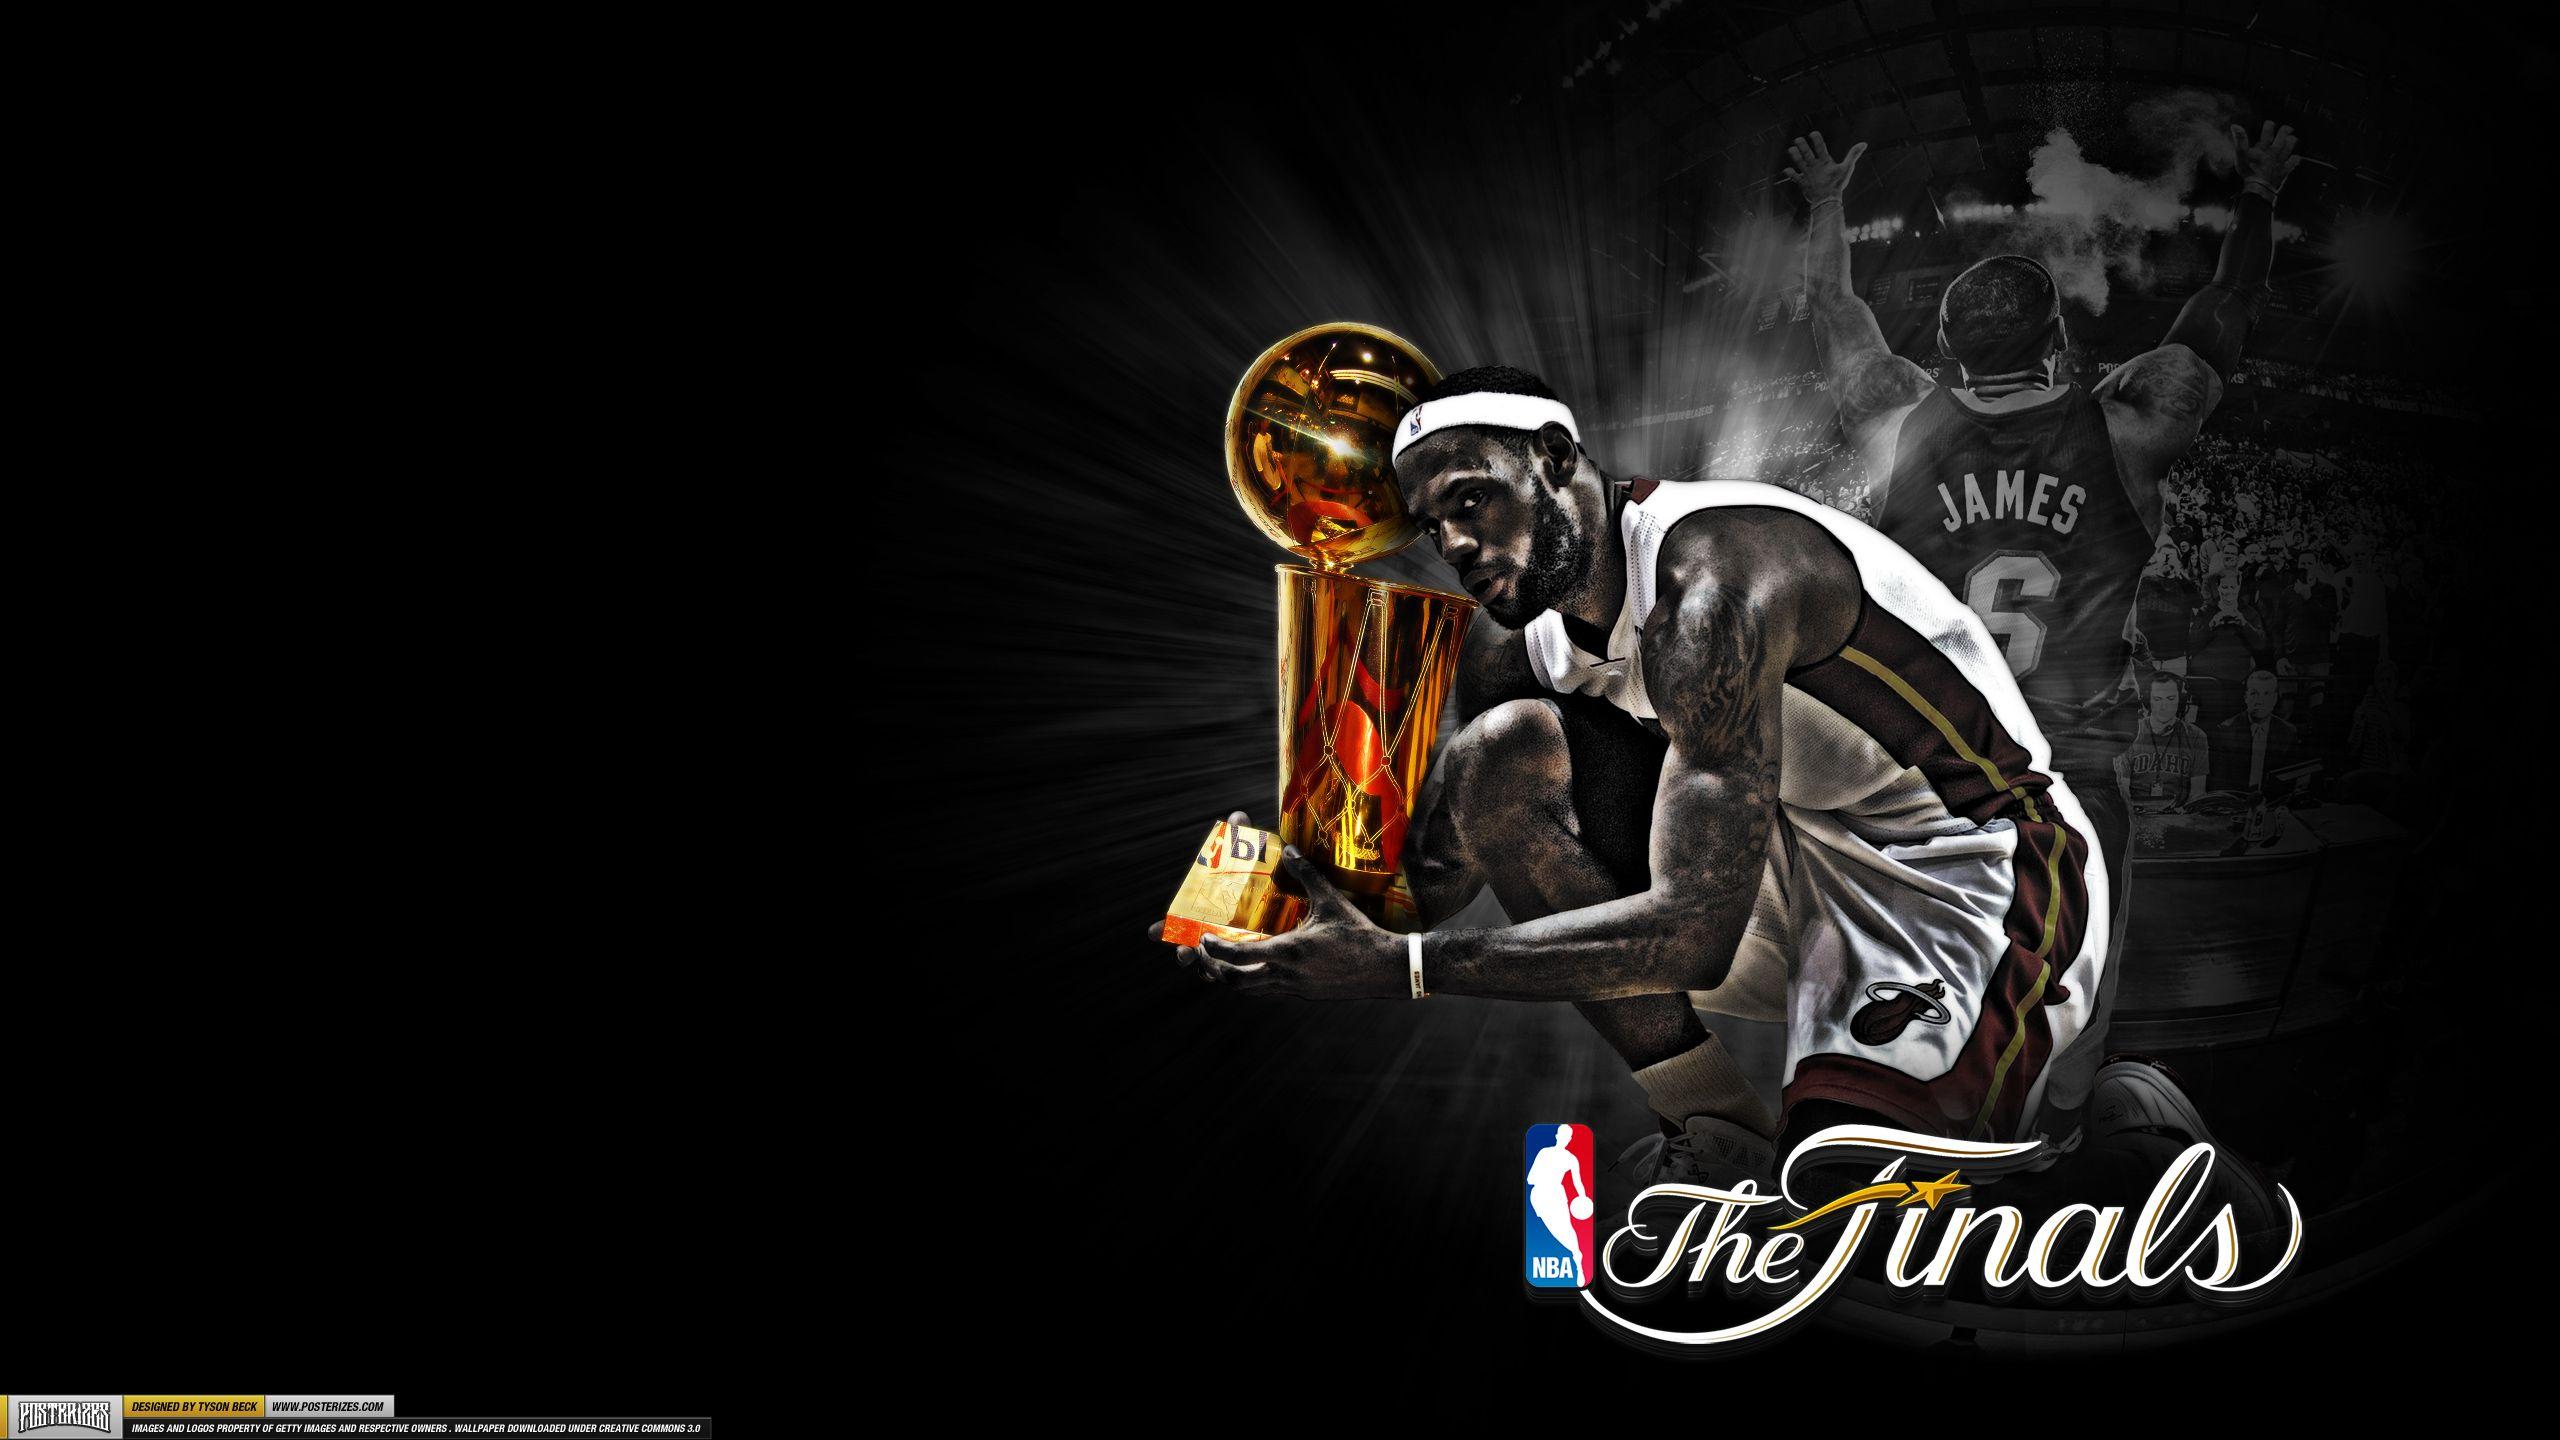 lebron james wallpapers basketball wallpapers at | hd wallpapers